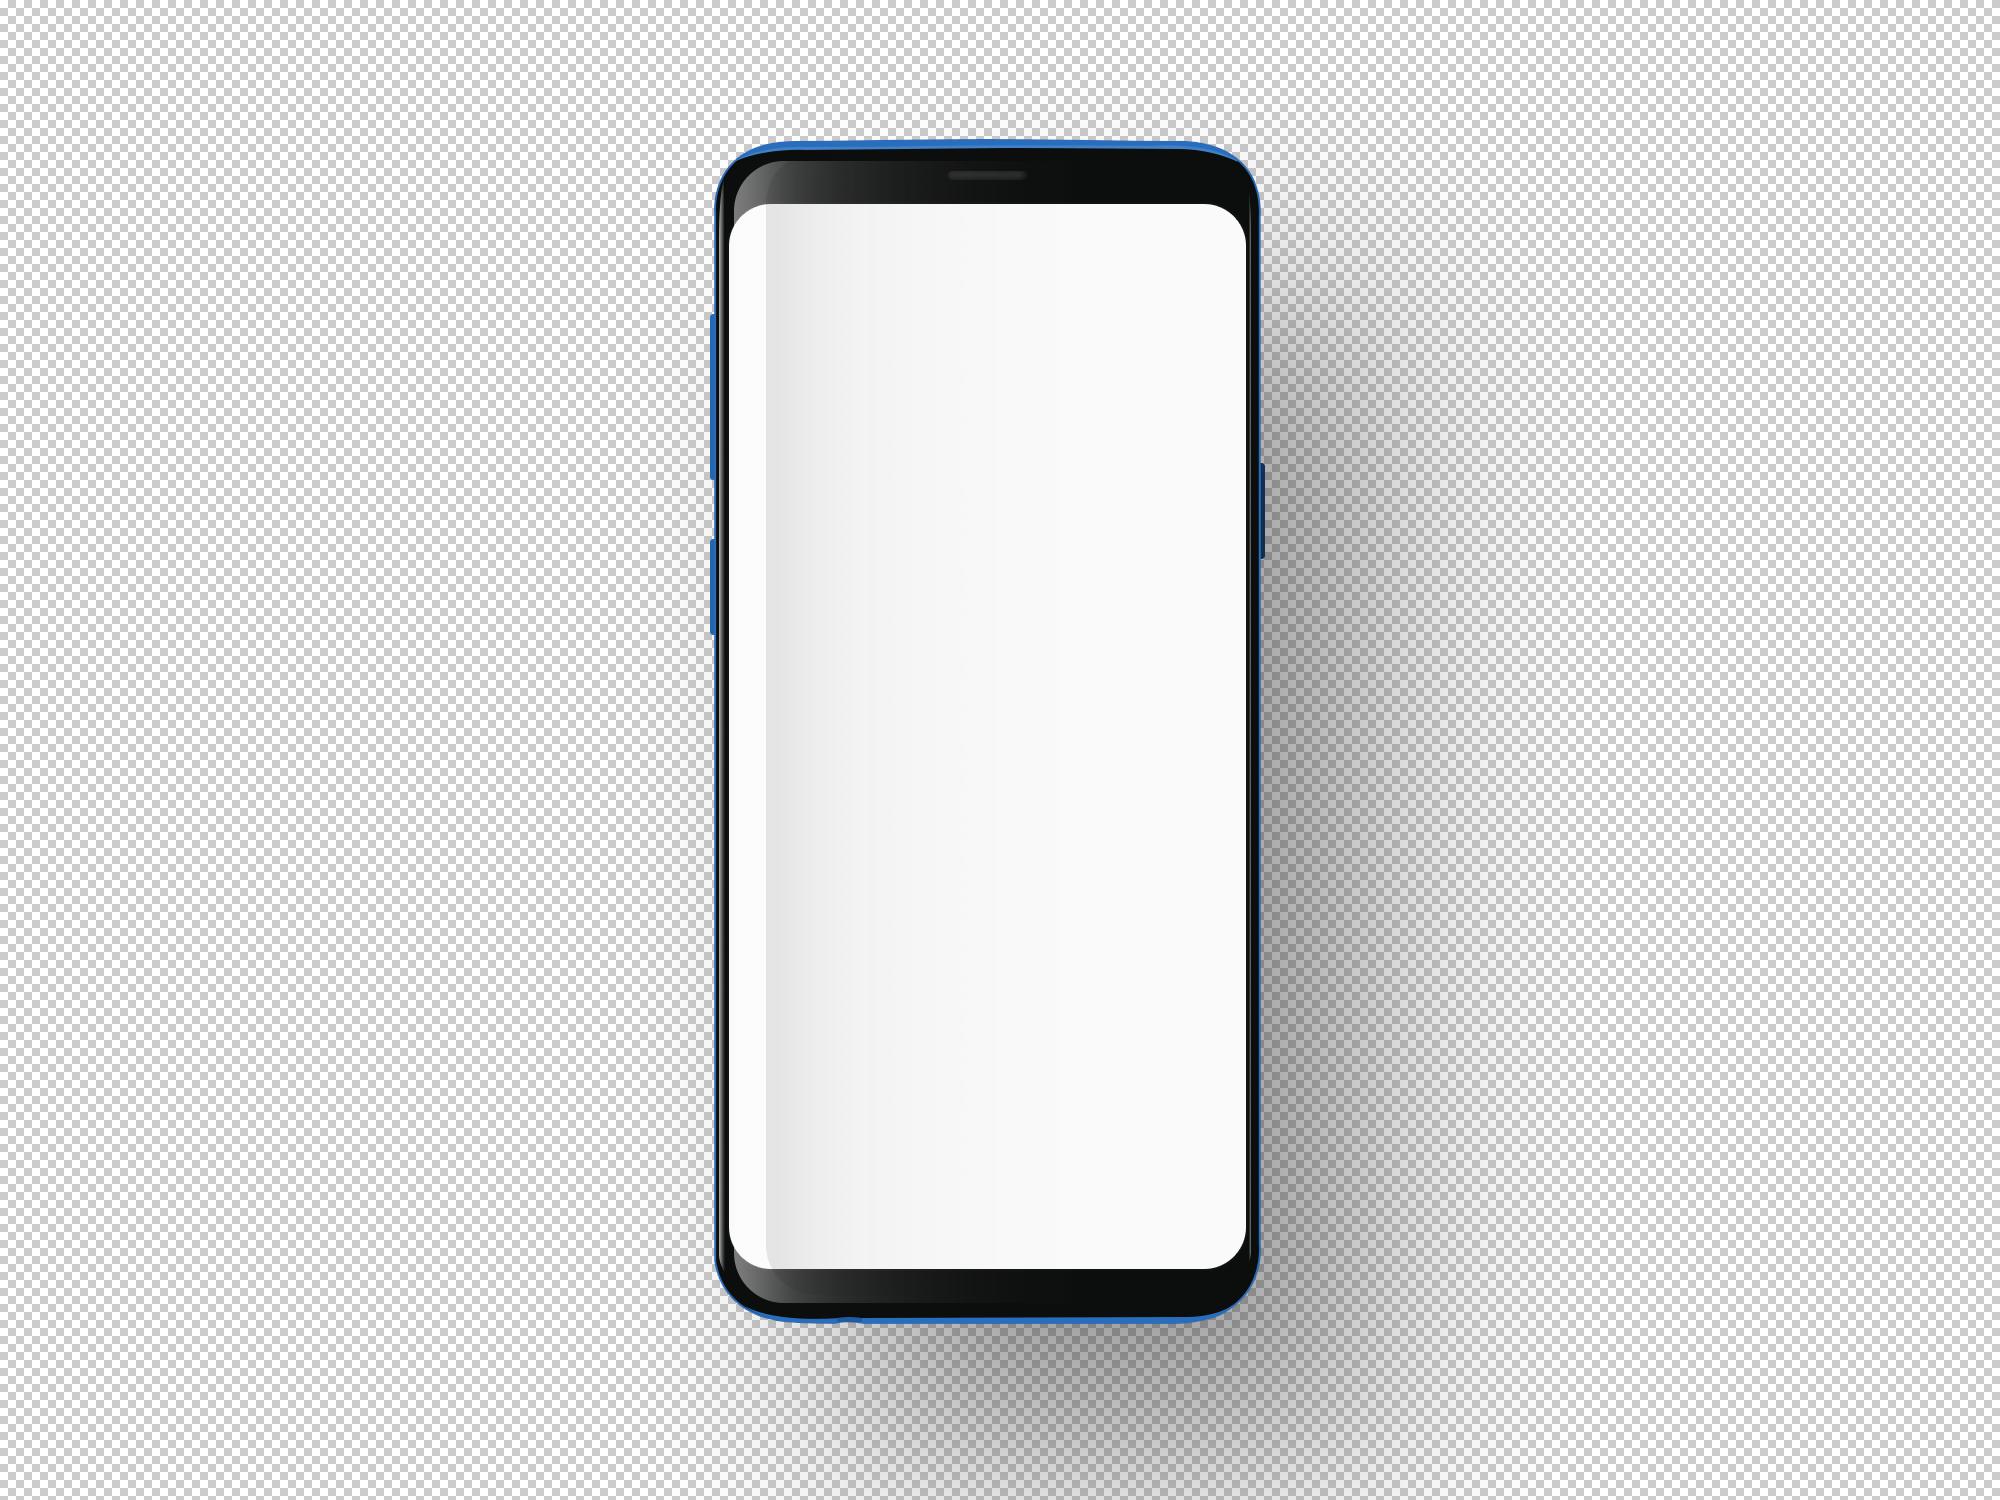 Samsung Galaxy S9 Mockup 2